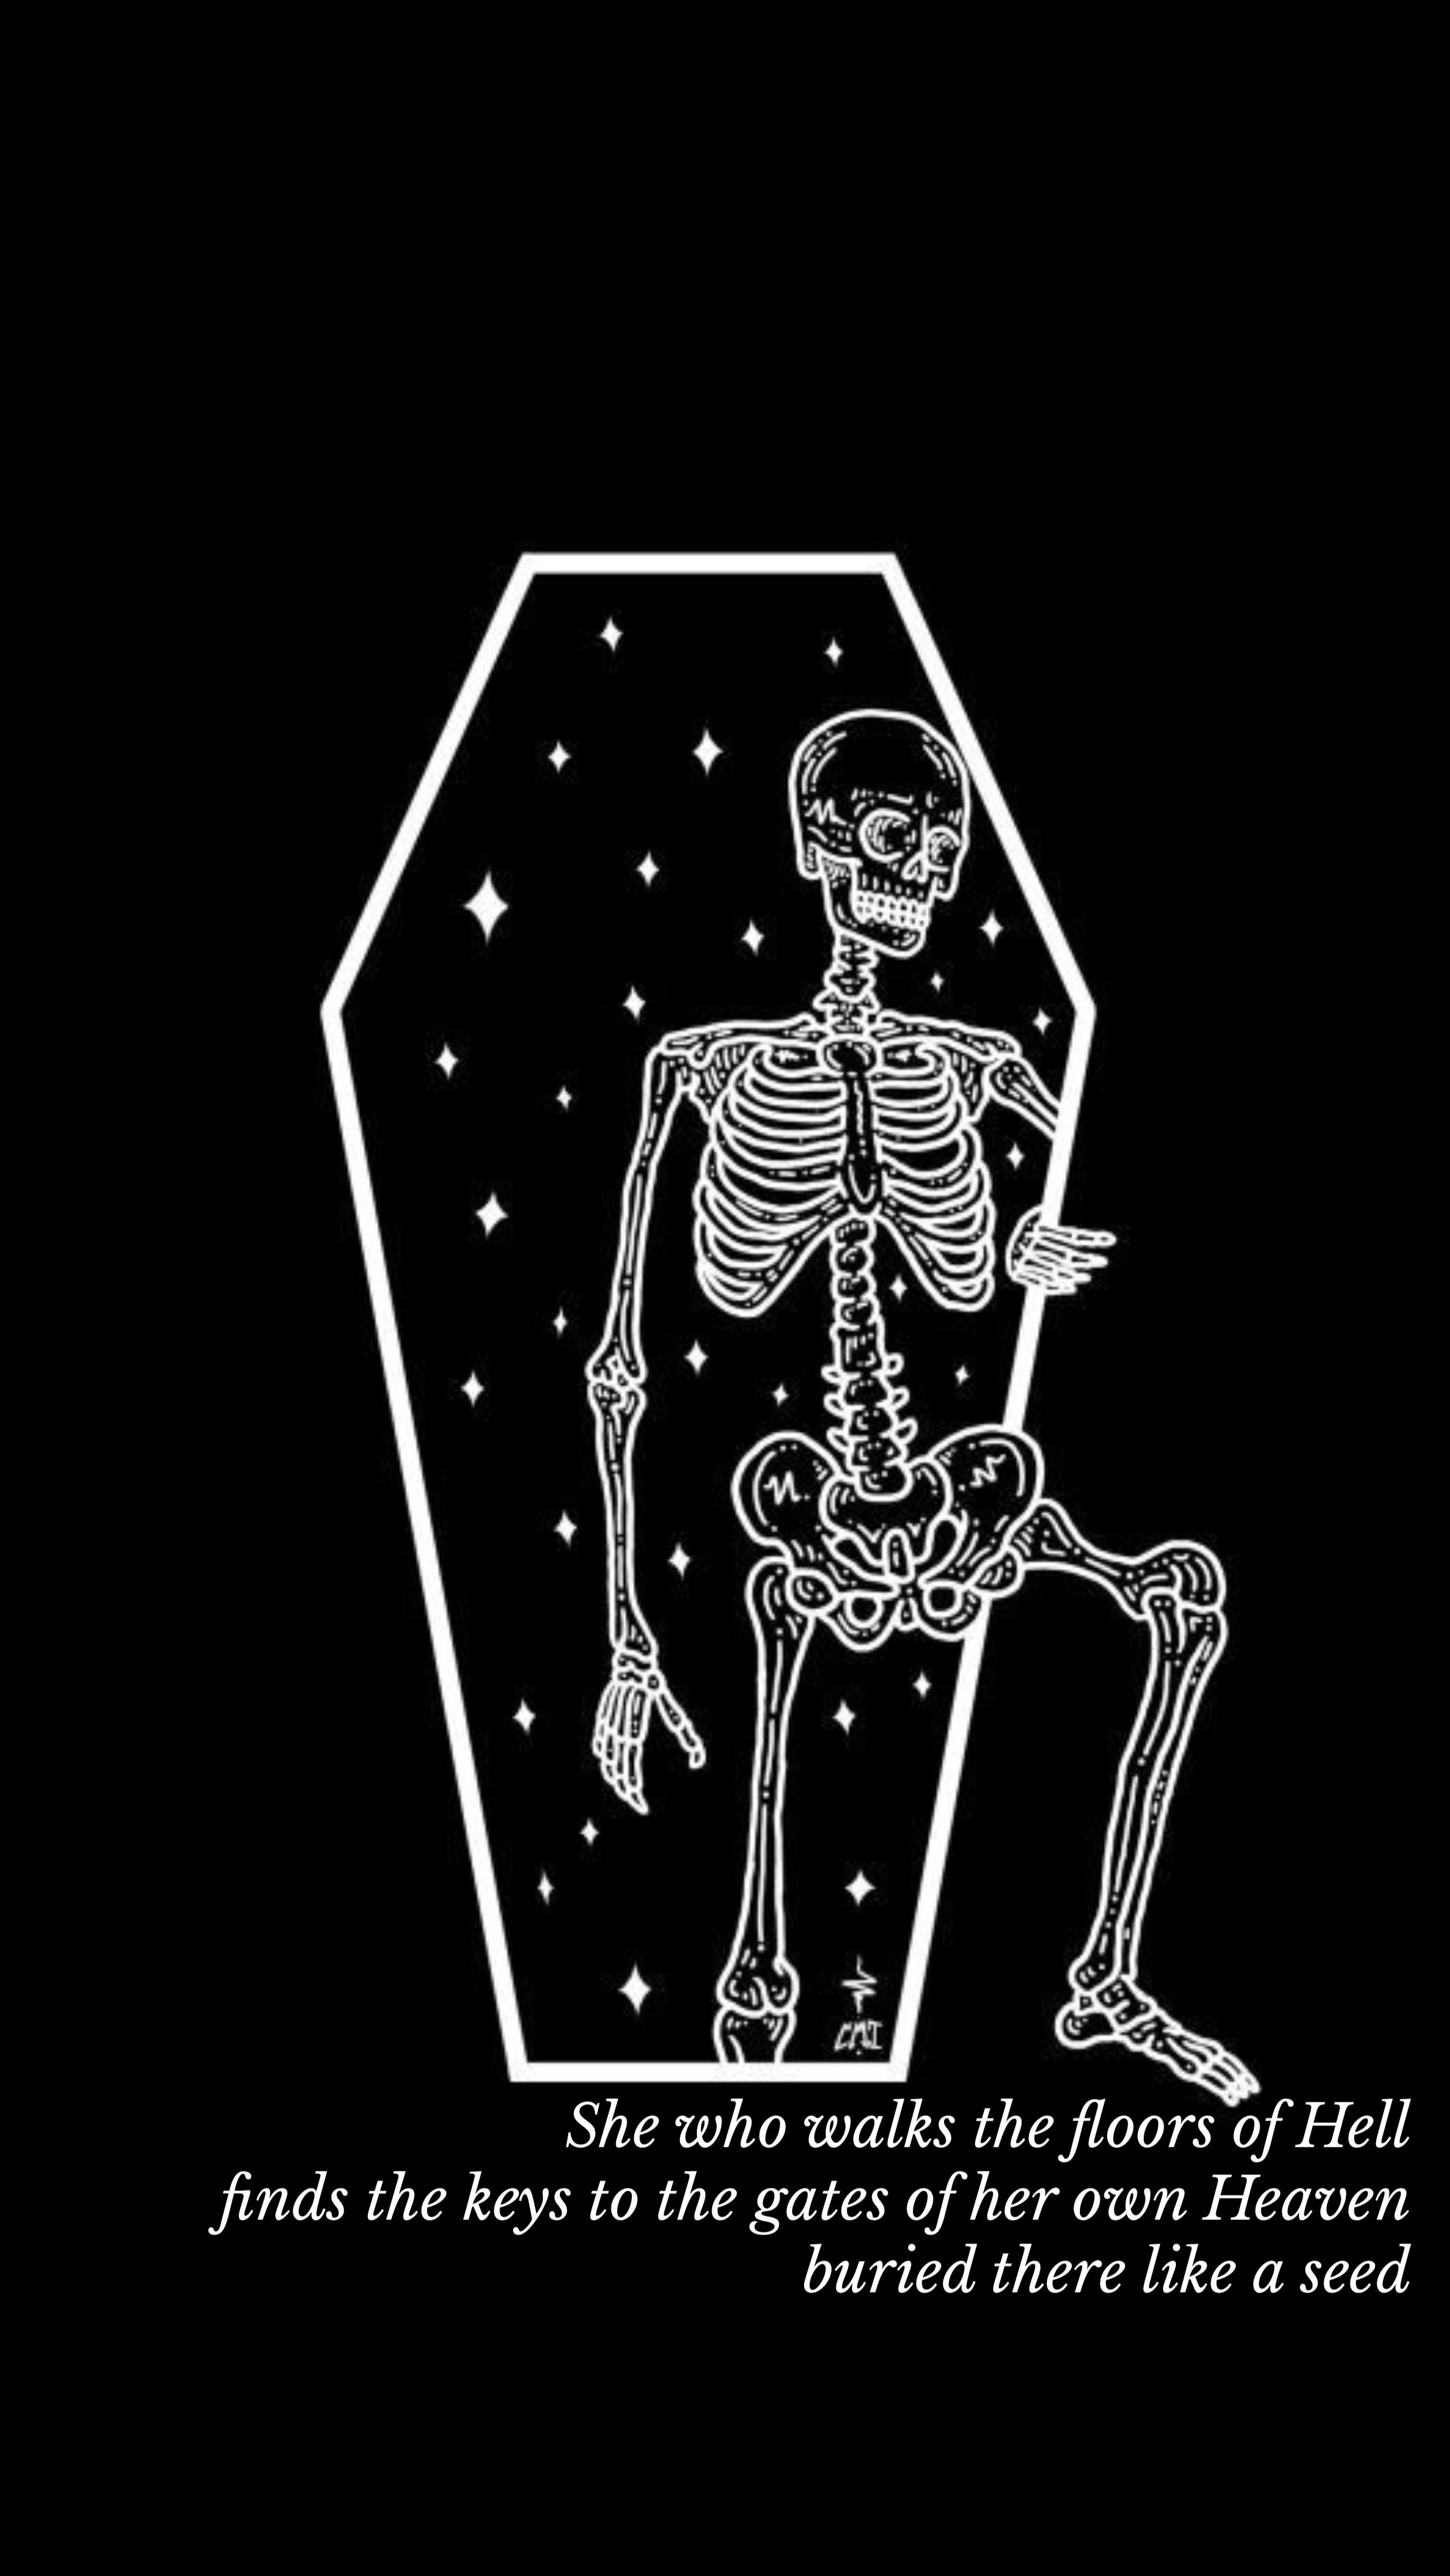 Pin By Alexa Jacinto On Wallpapers Skeleton Art Skull Art Iphone Wallpaper